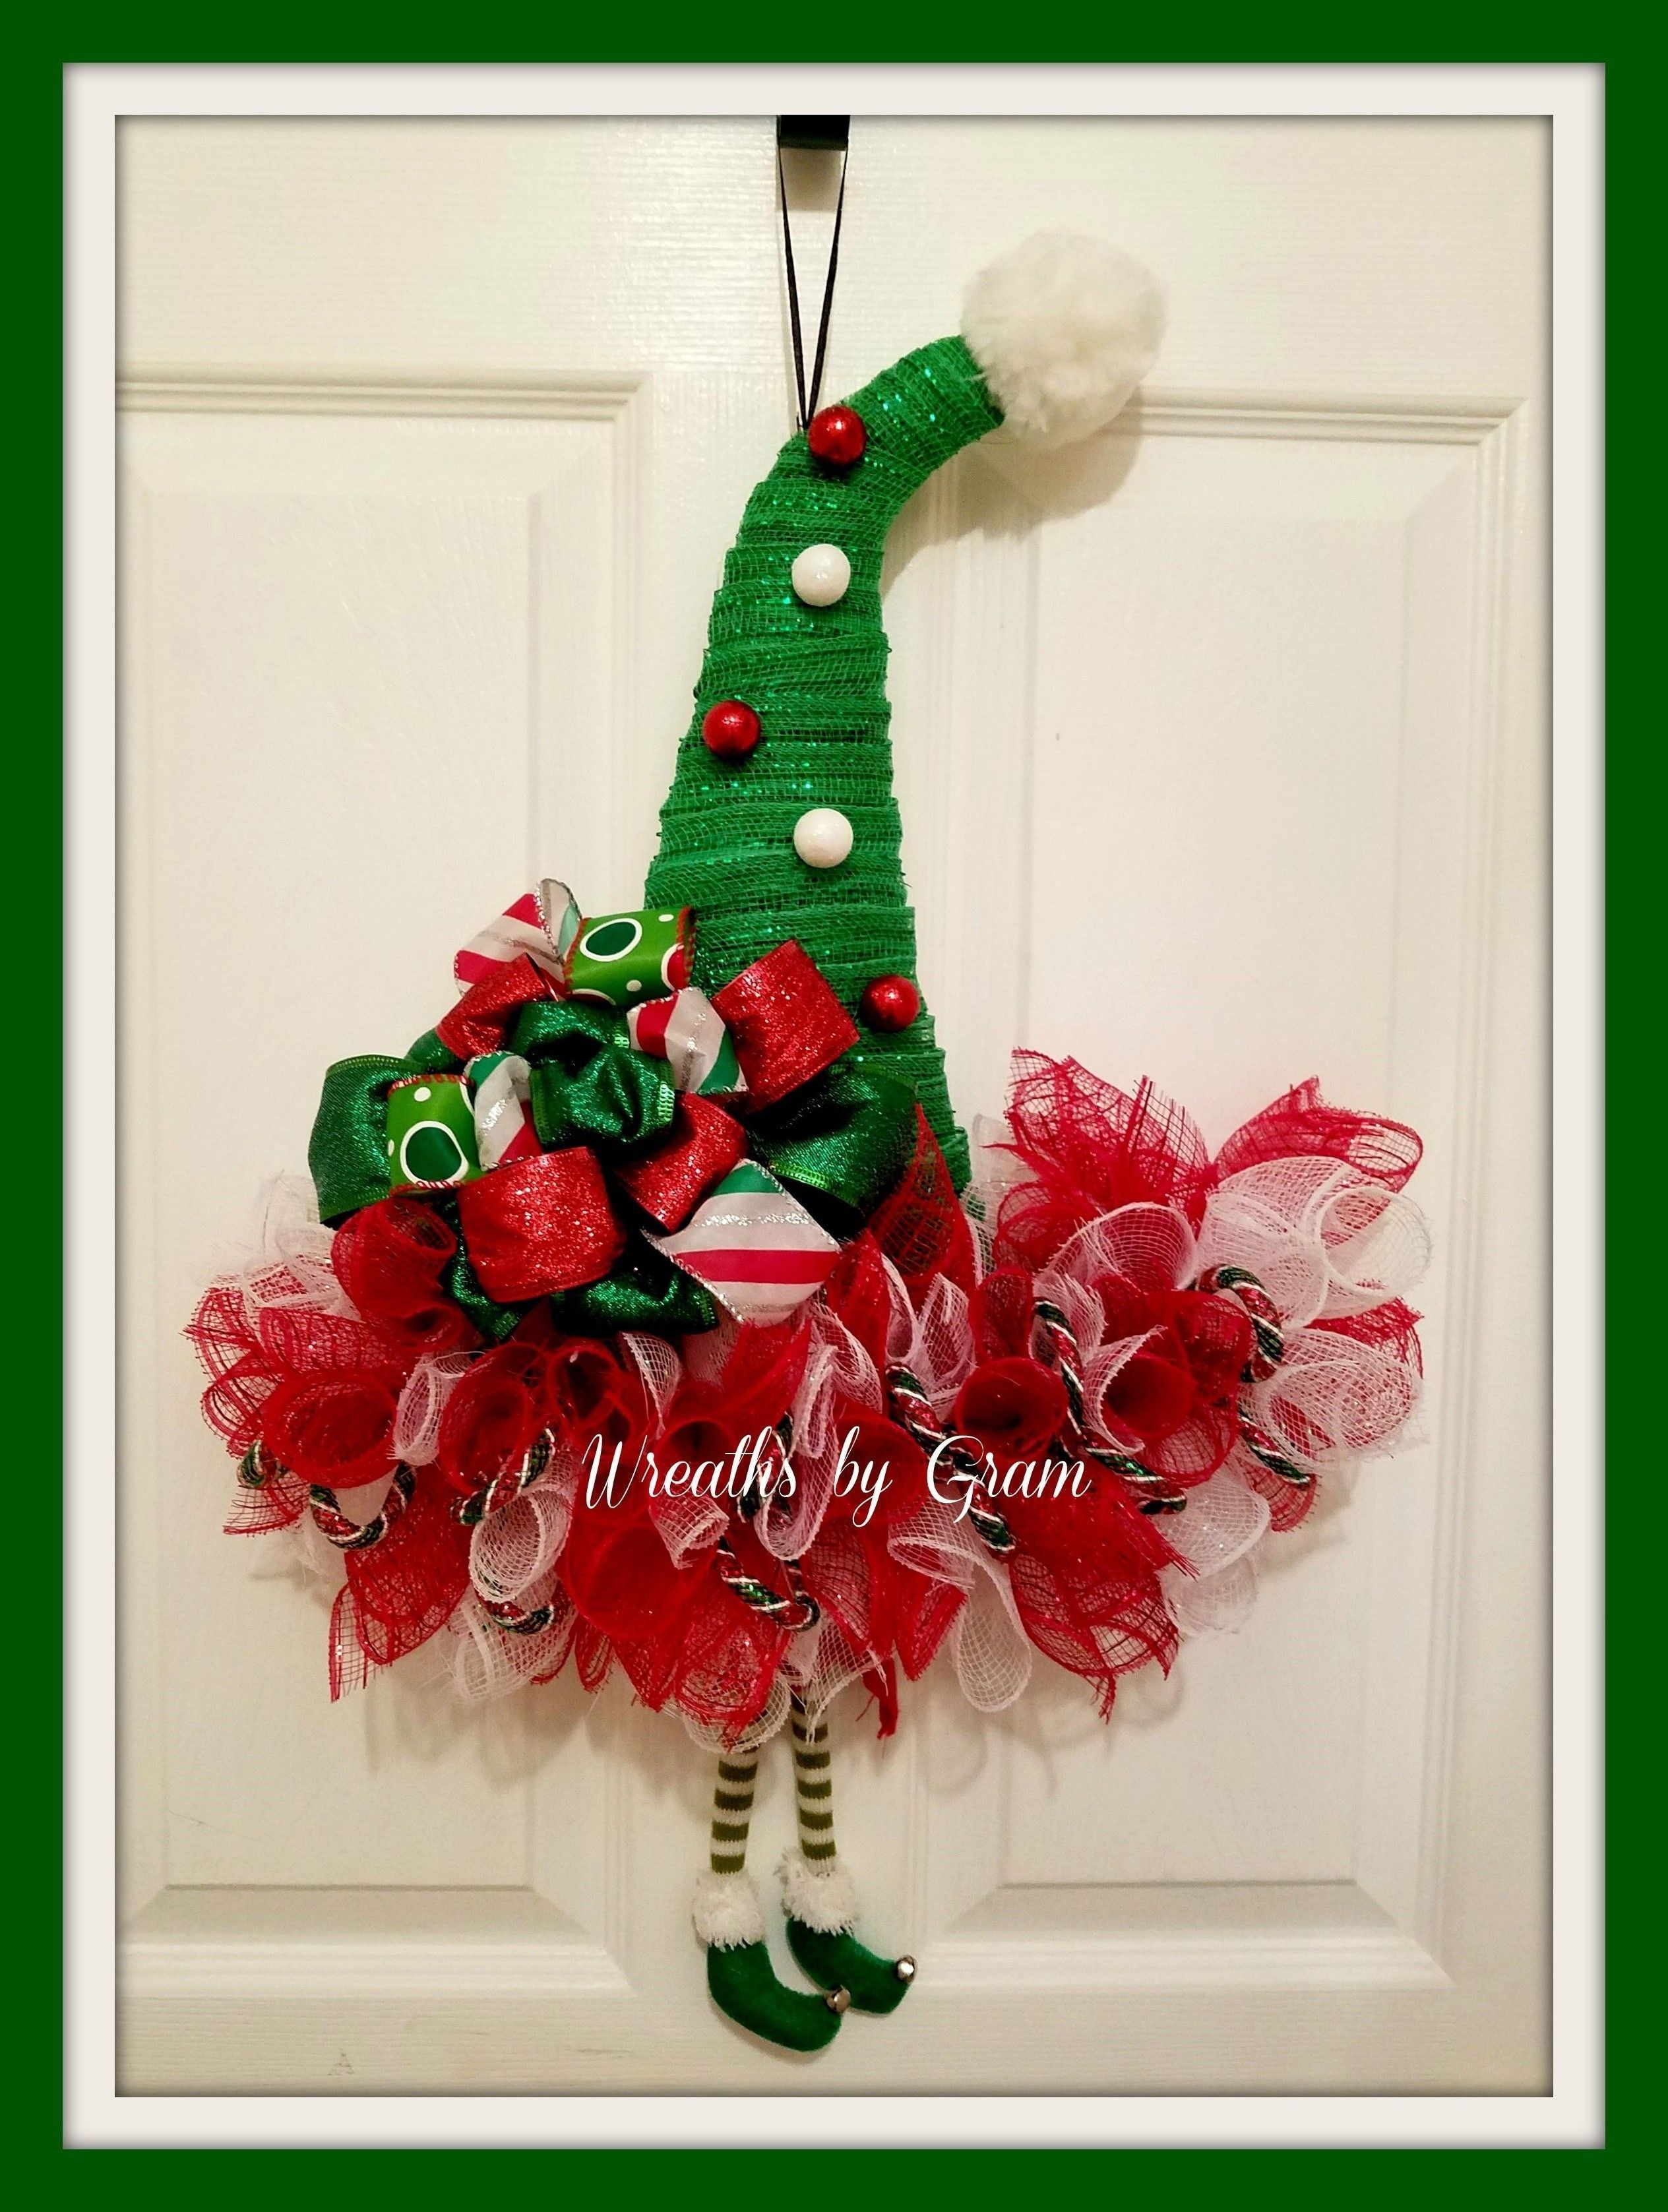 Elf Hat Wreath, Christmas Wreath, Elf Wreath, Christmas Decor, Elf